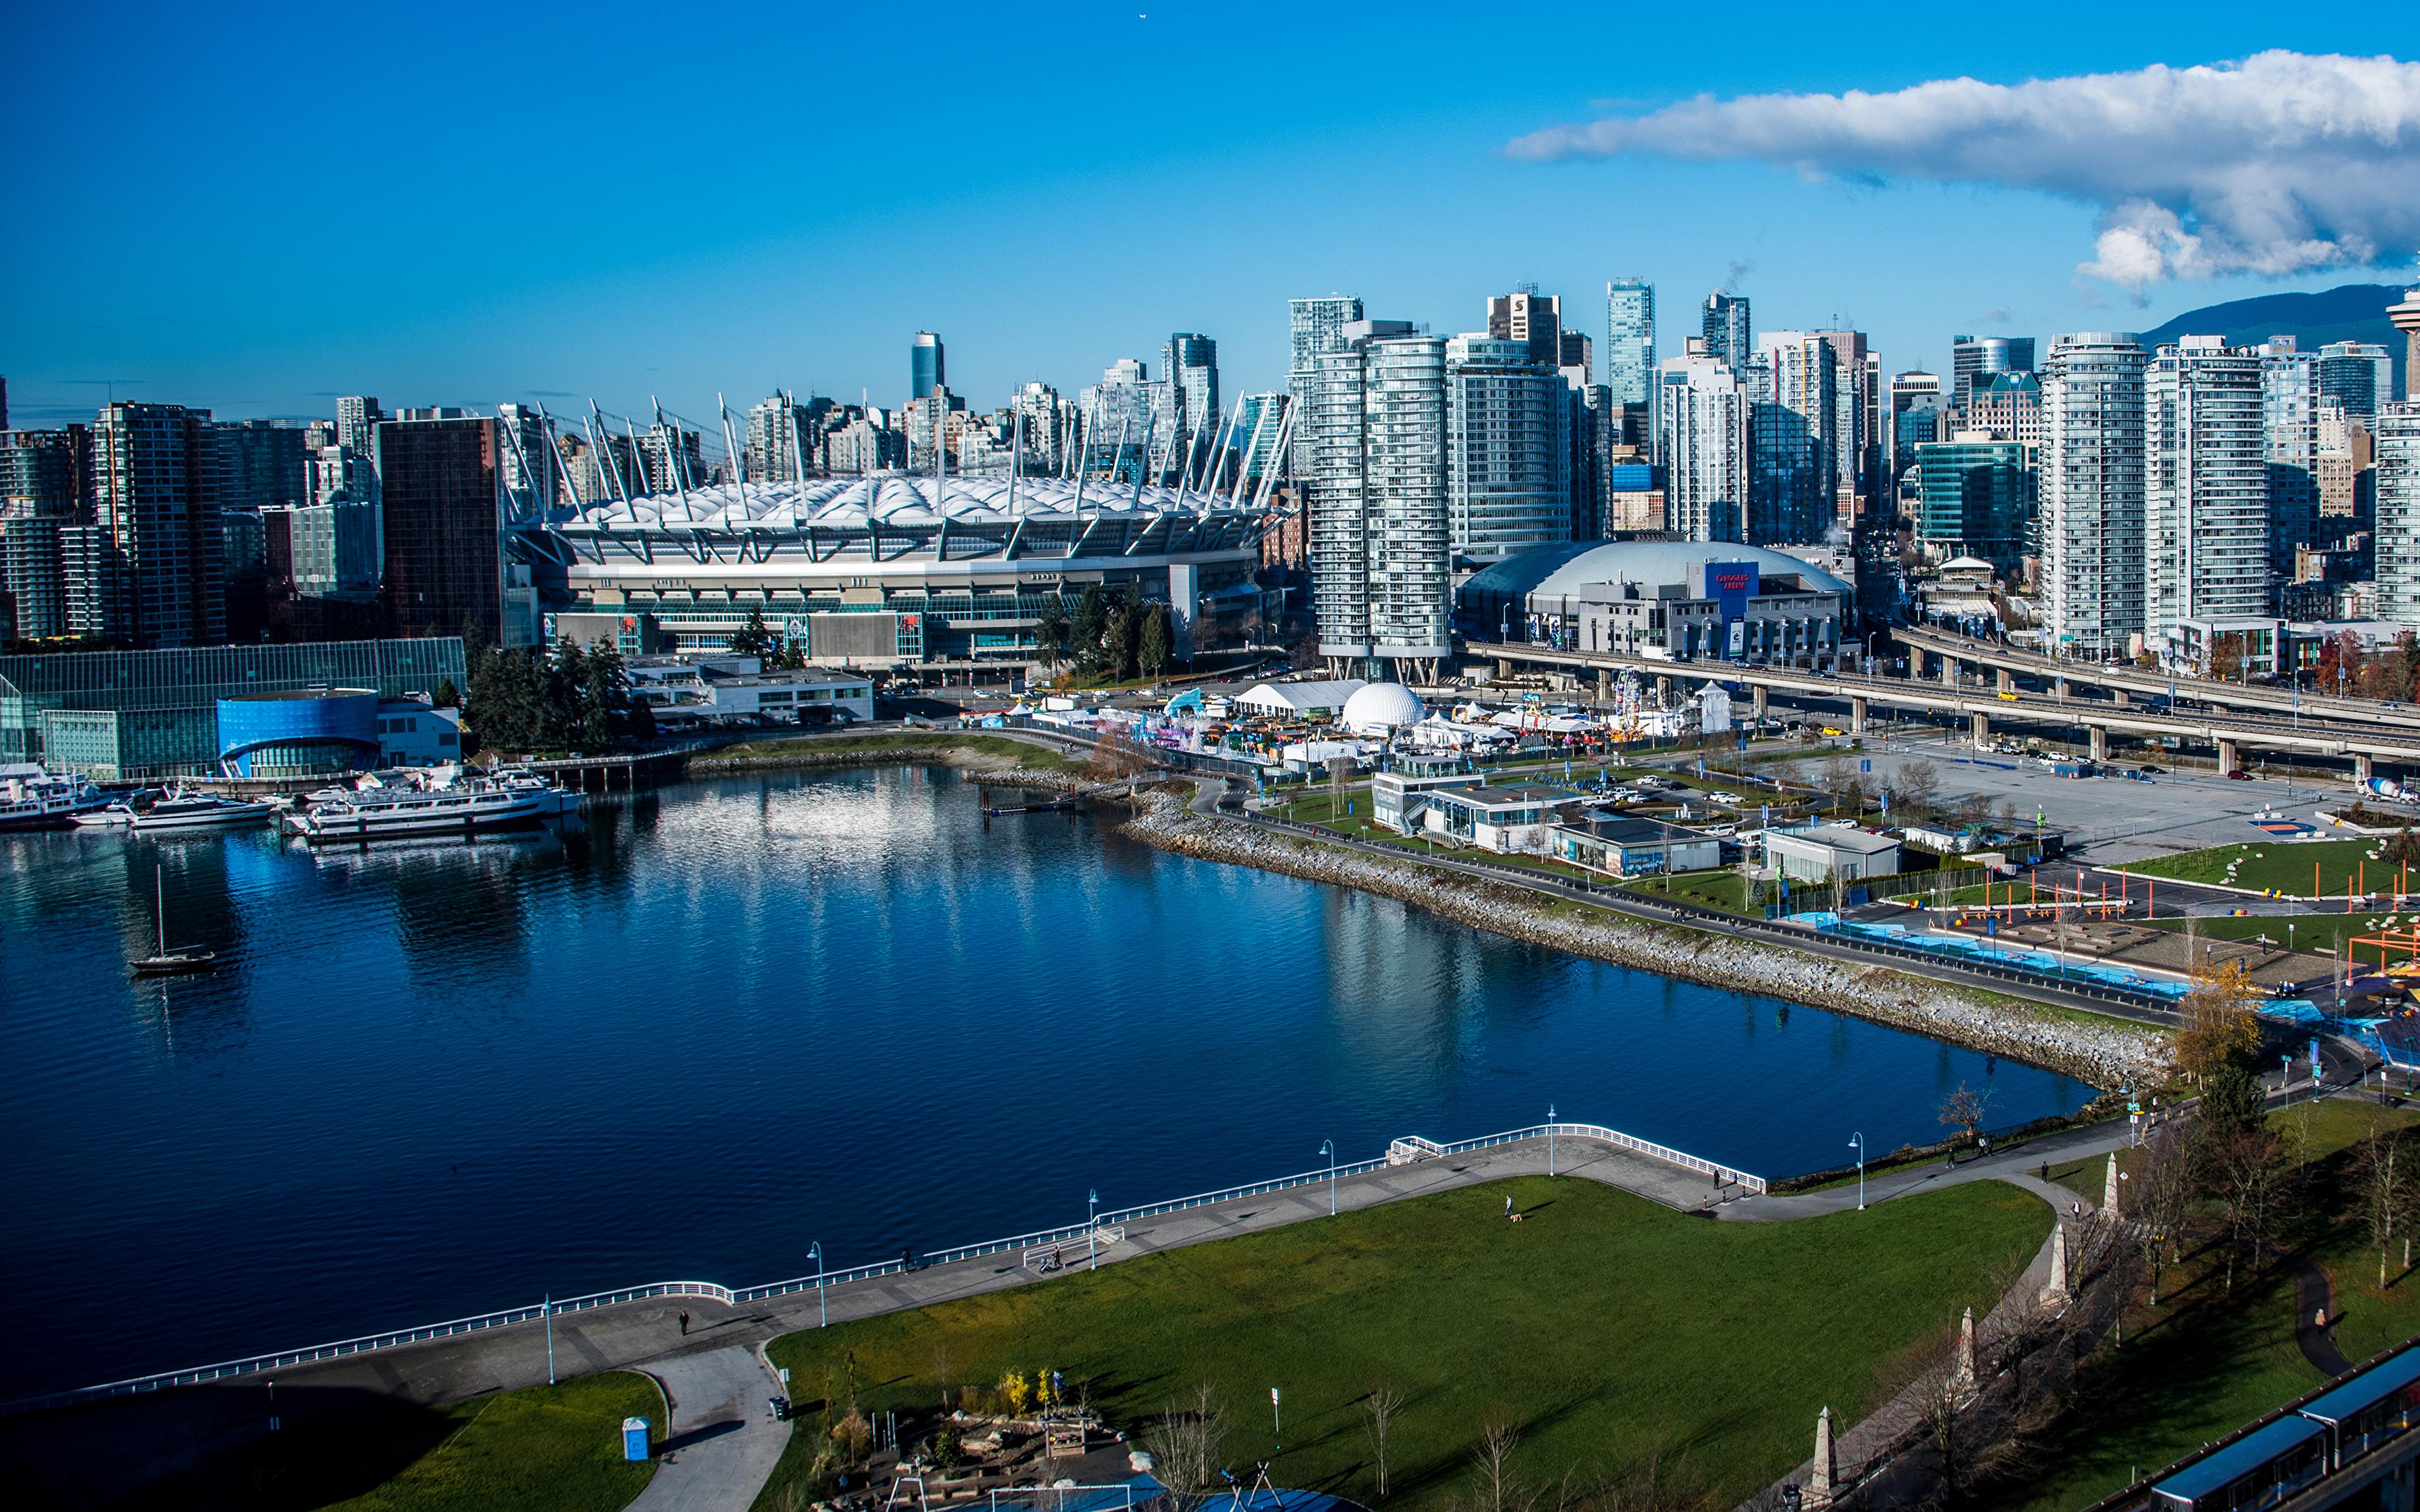 Фото Ванкувер Канада Залив Причалы город Здания 3840x2400 Пирсы залива заливы Пристань Дома Города